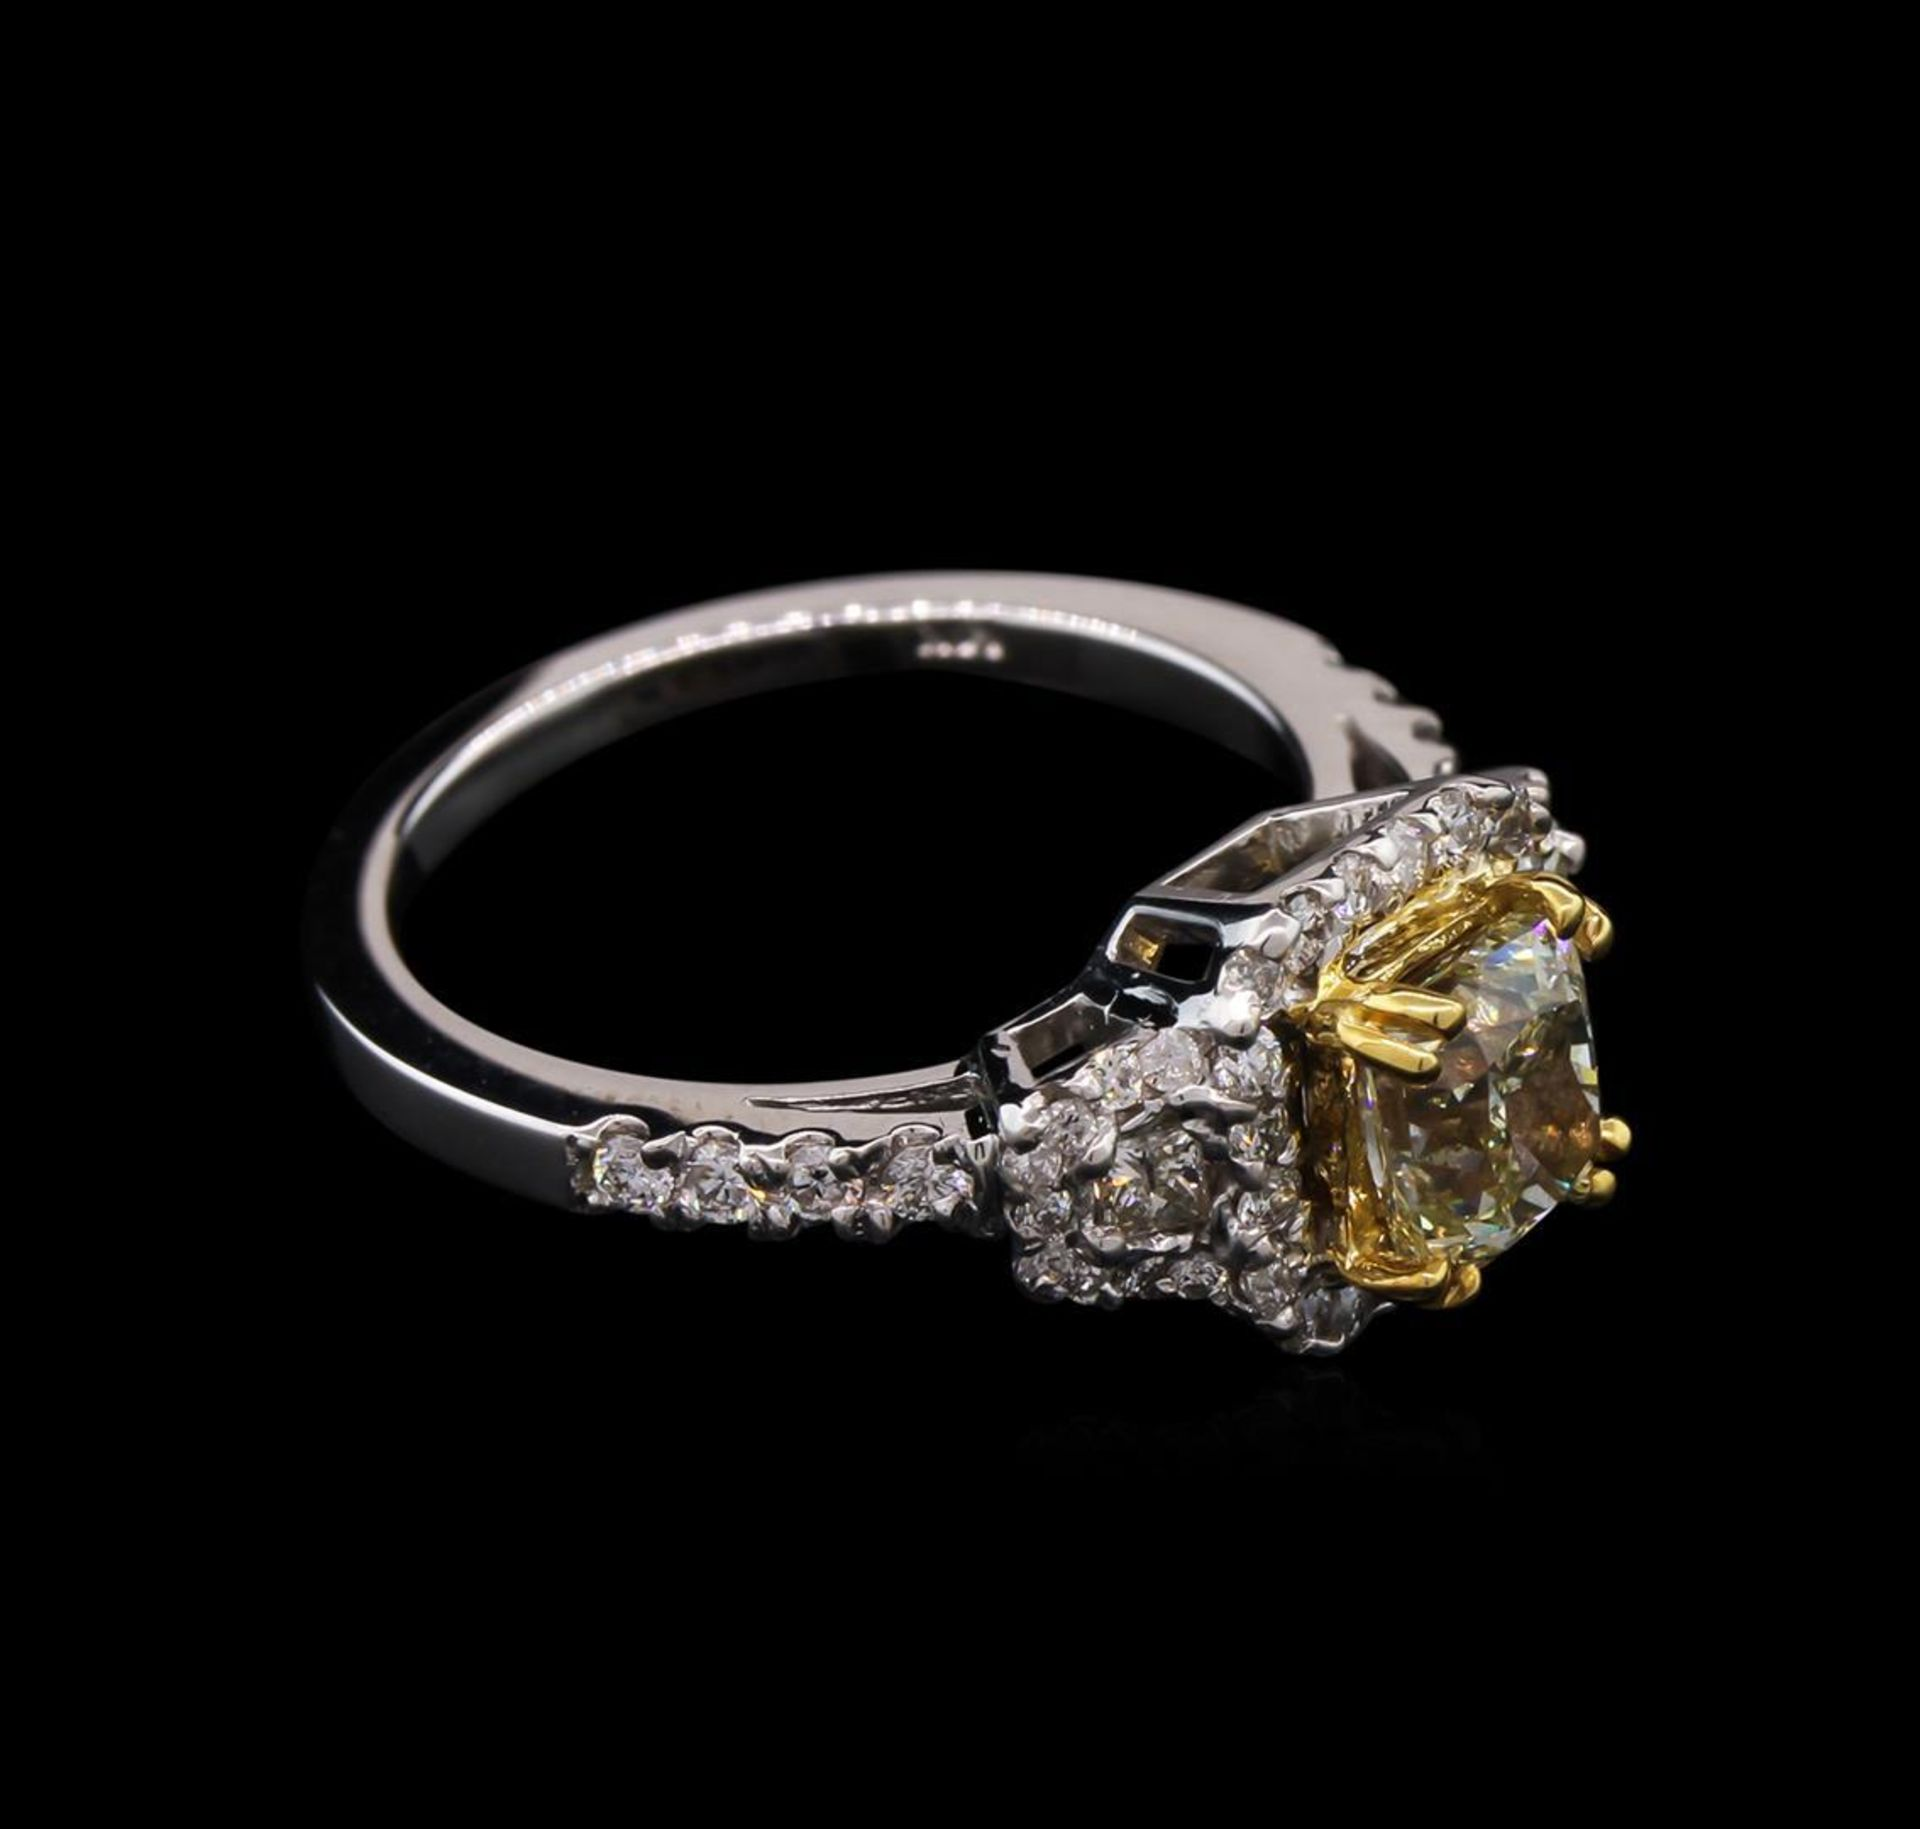 1.67 ctw Light Yellow Diamond Ring - 14KT White Gold